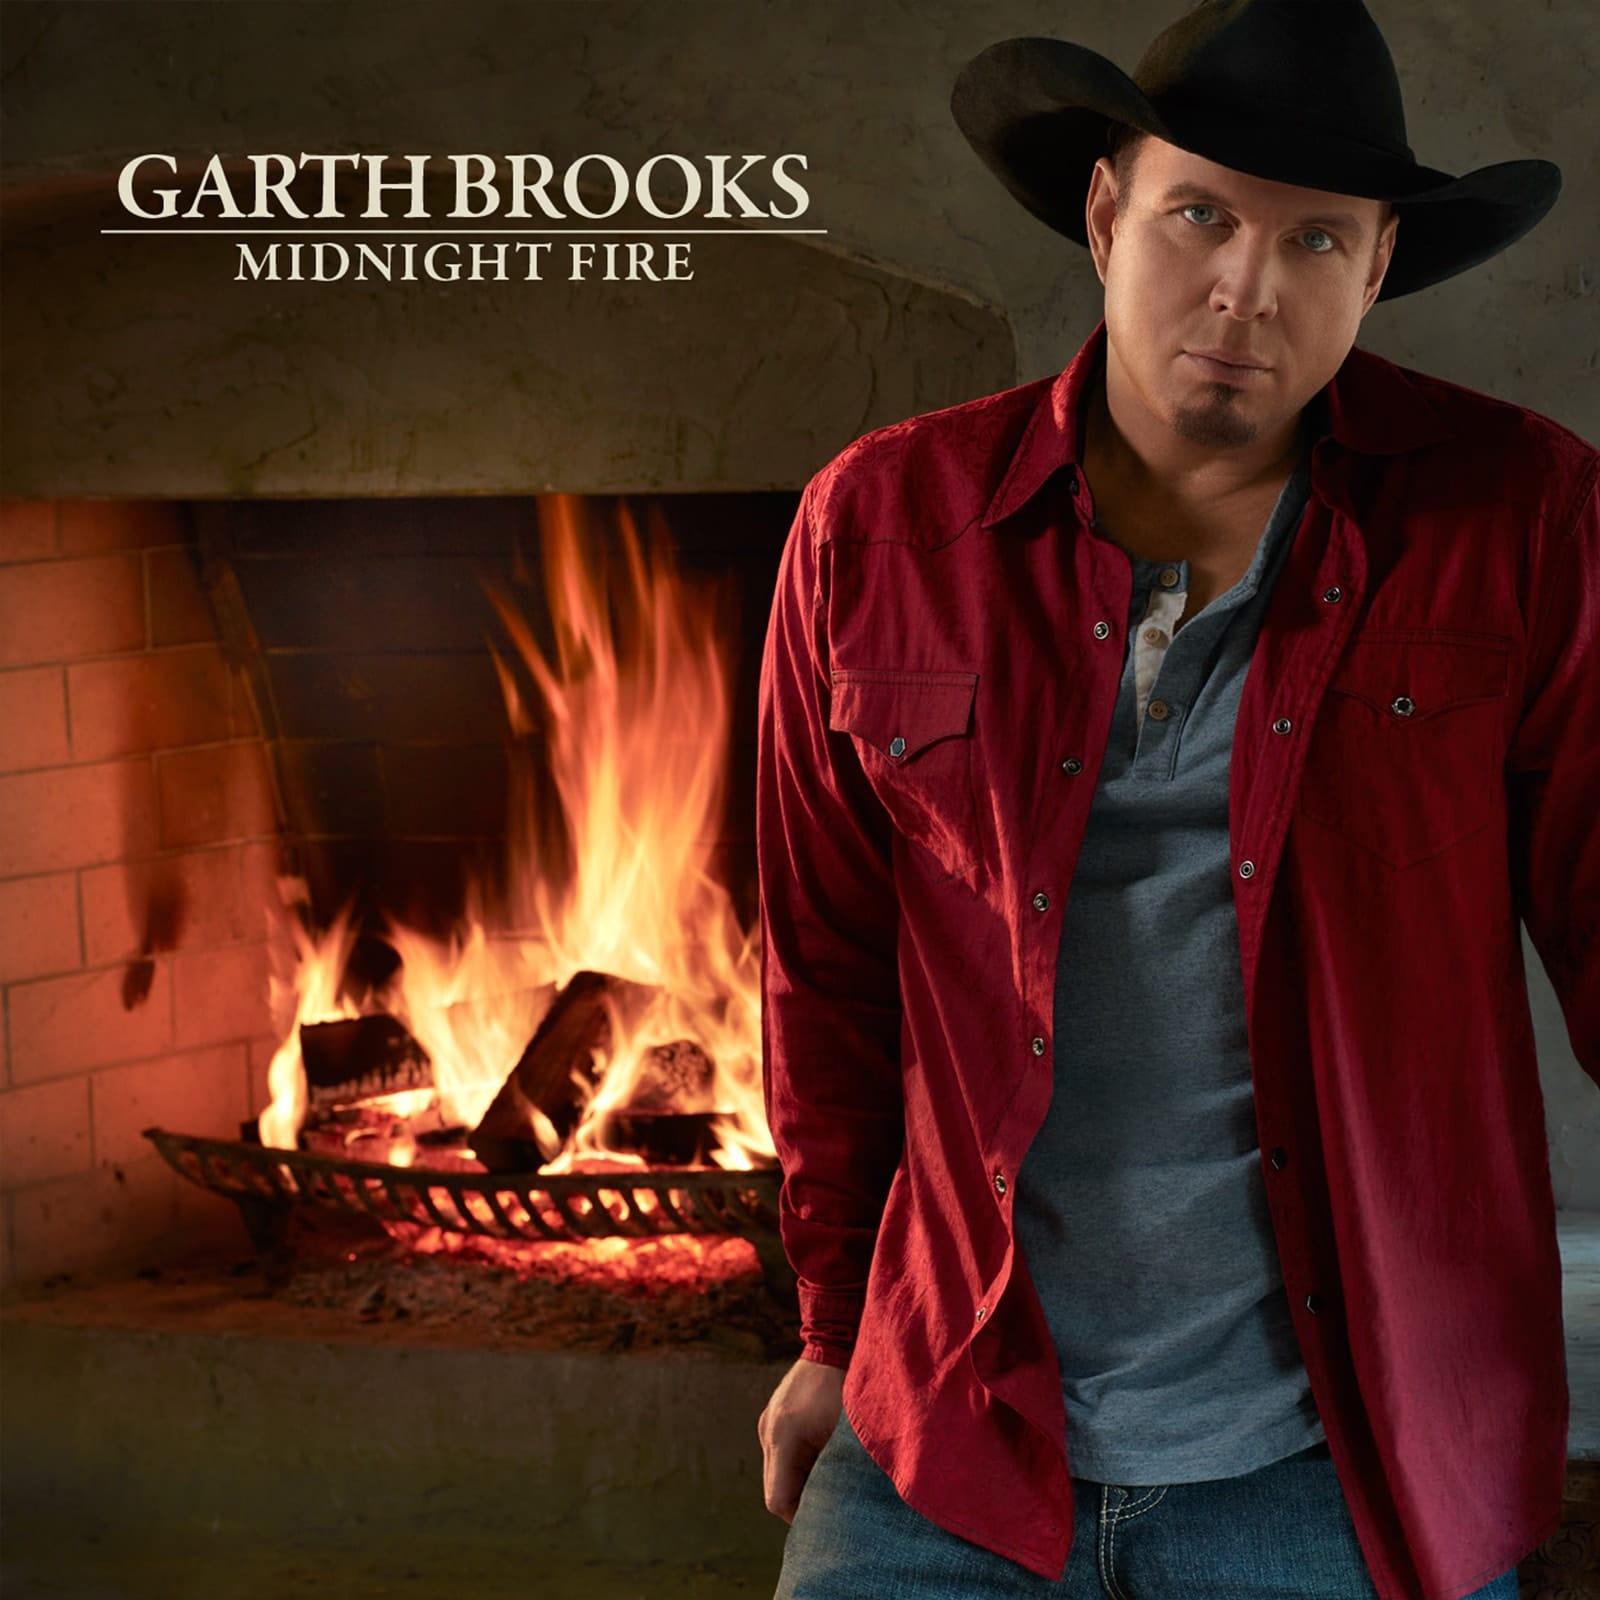 Garth Brooks Christmas Album.Garth Brooks The Ultimate Collection Album Covers